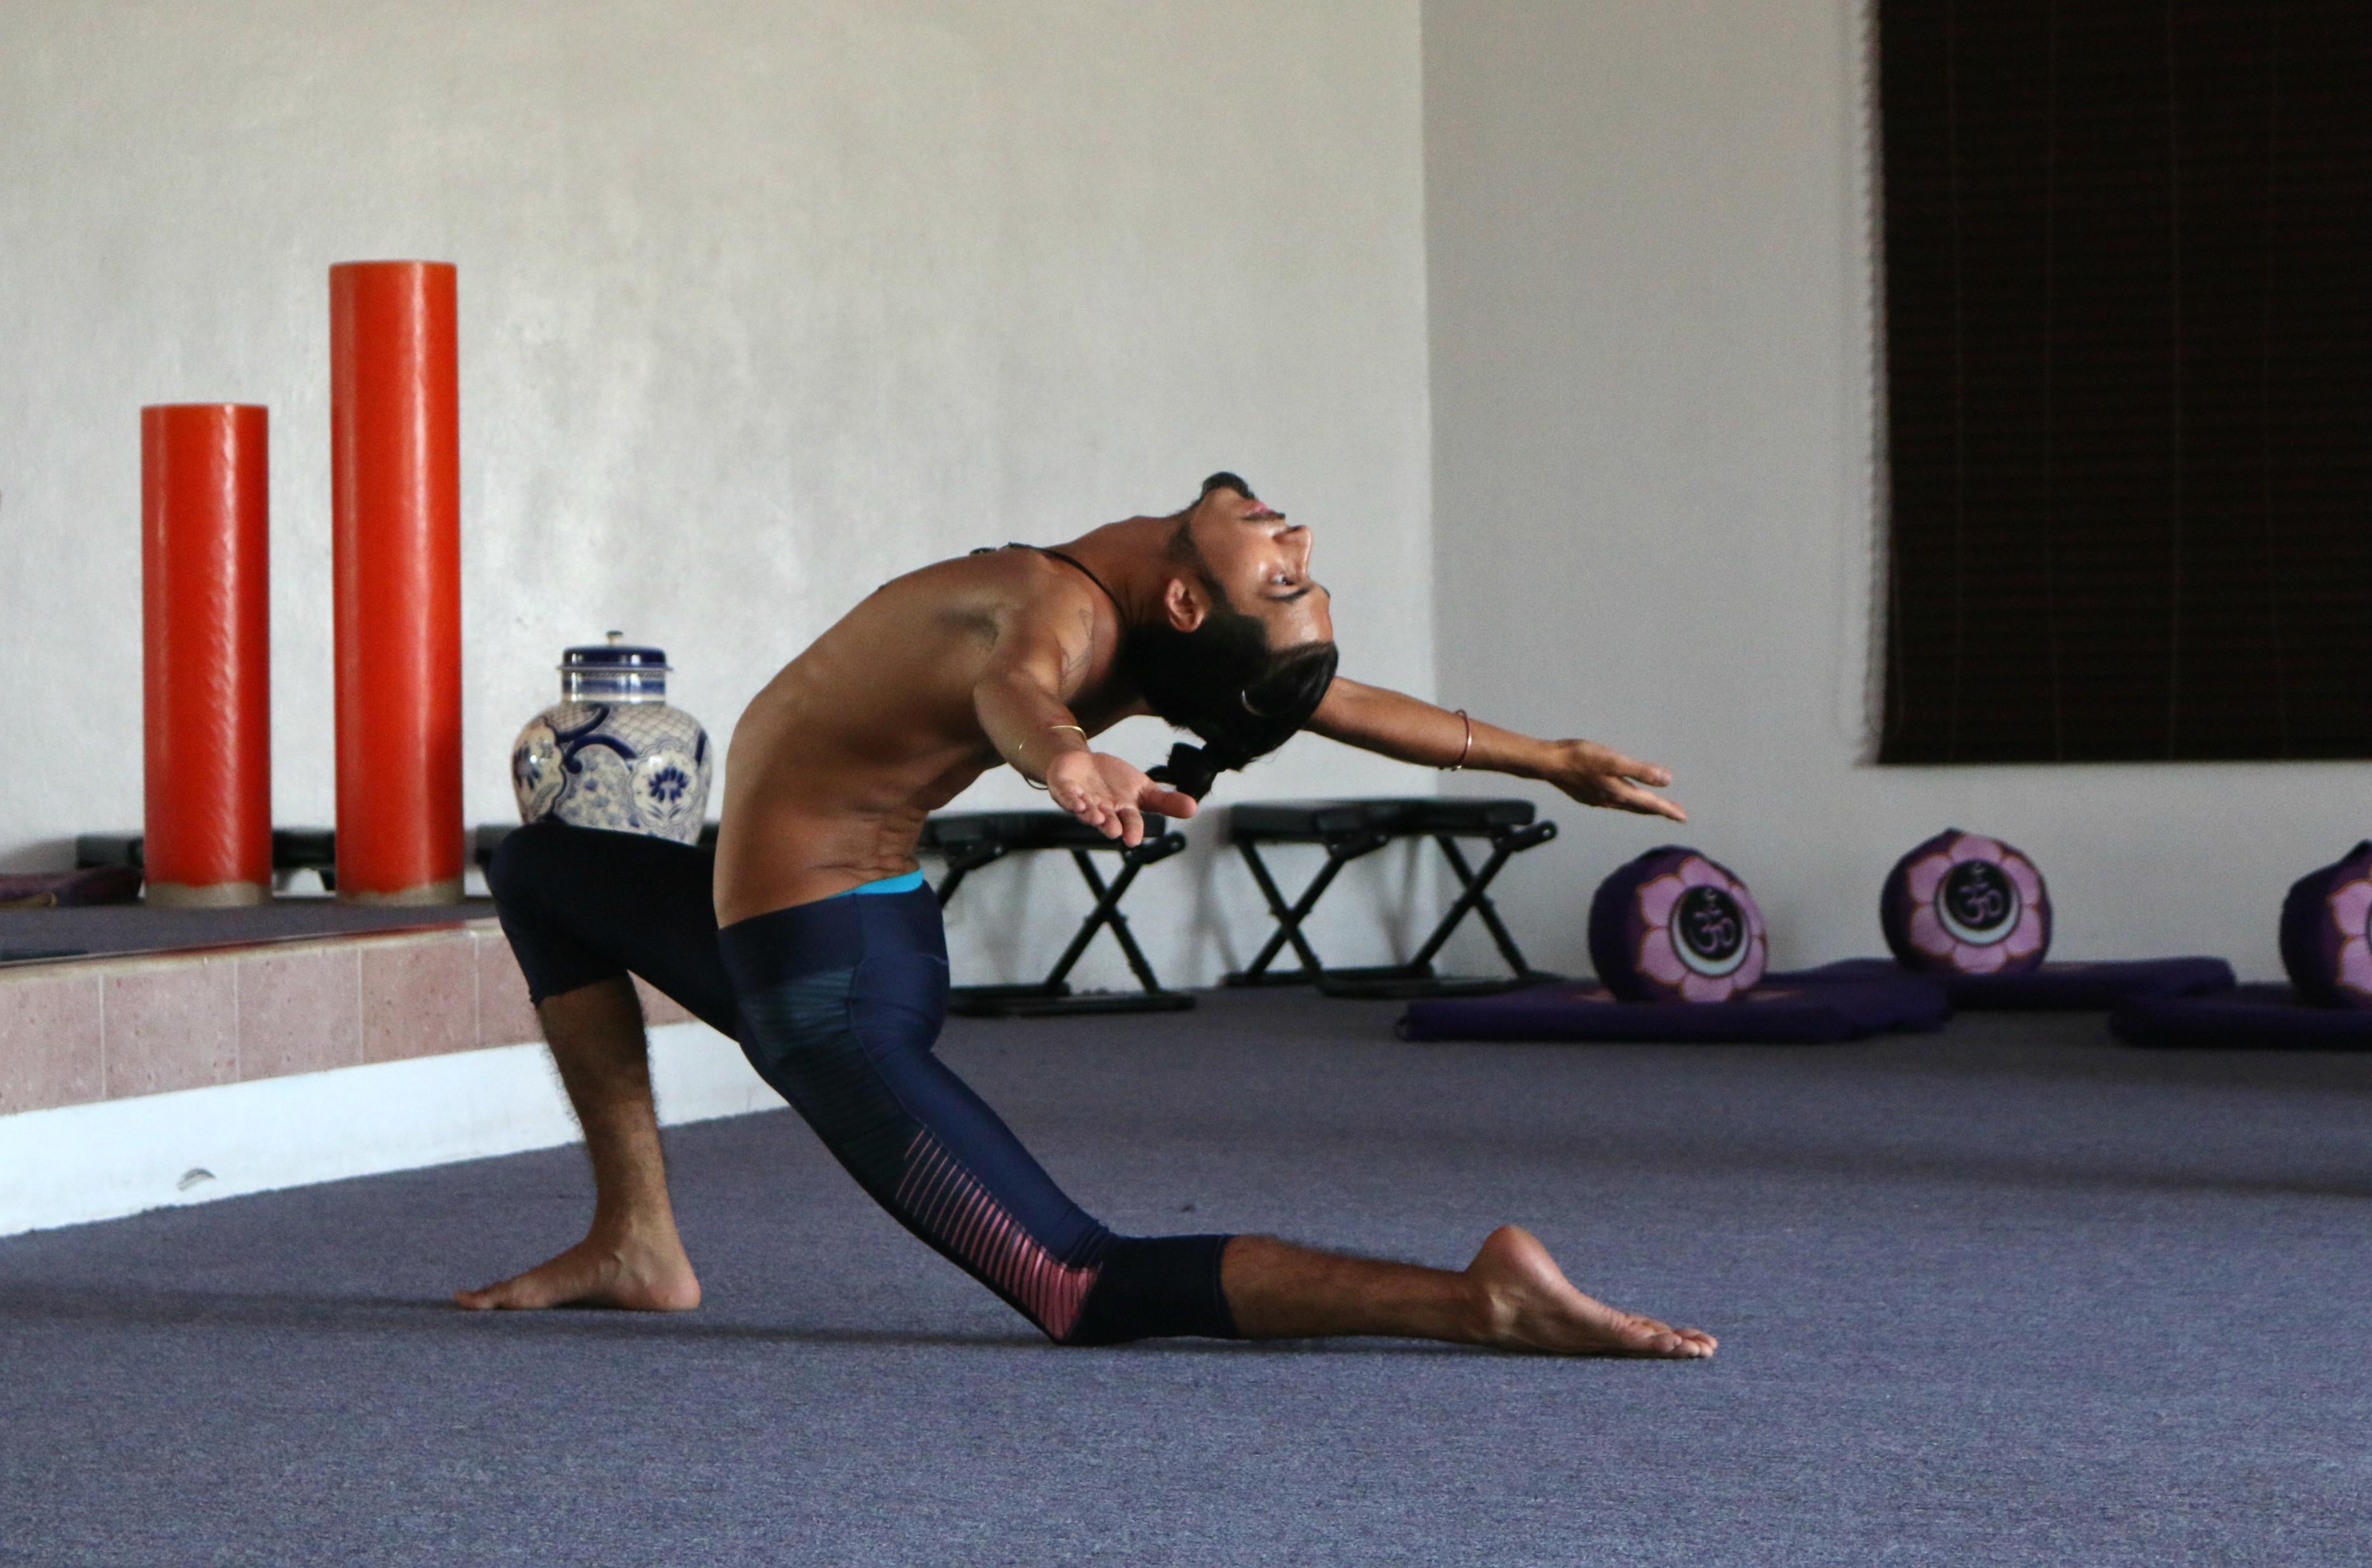 Joshua leading a class in The Yoga Studio at Hard Rock Riviera Maya.